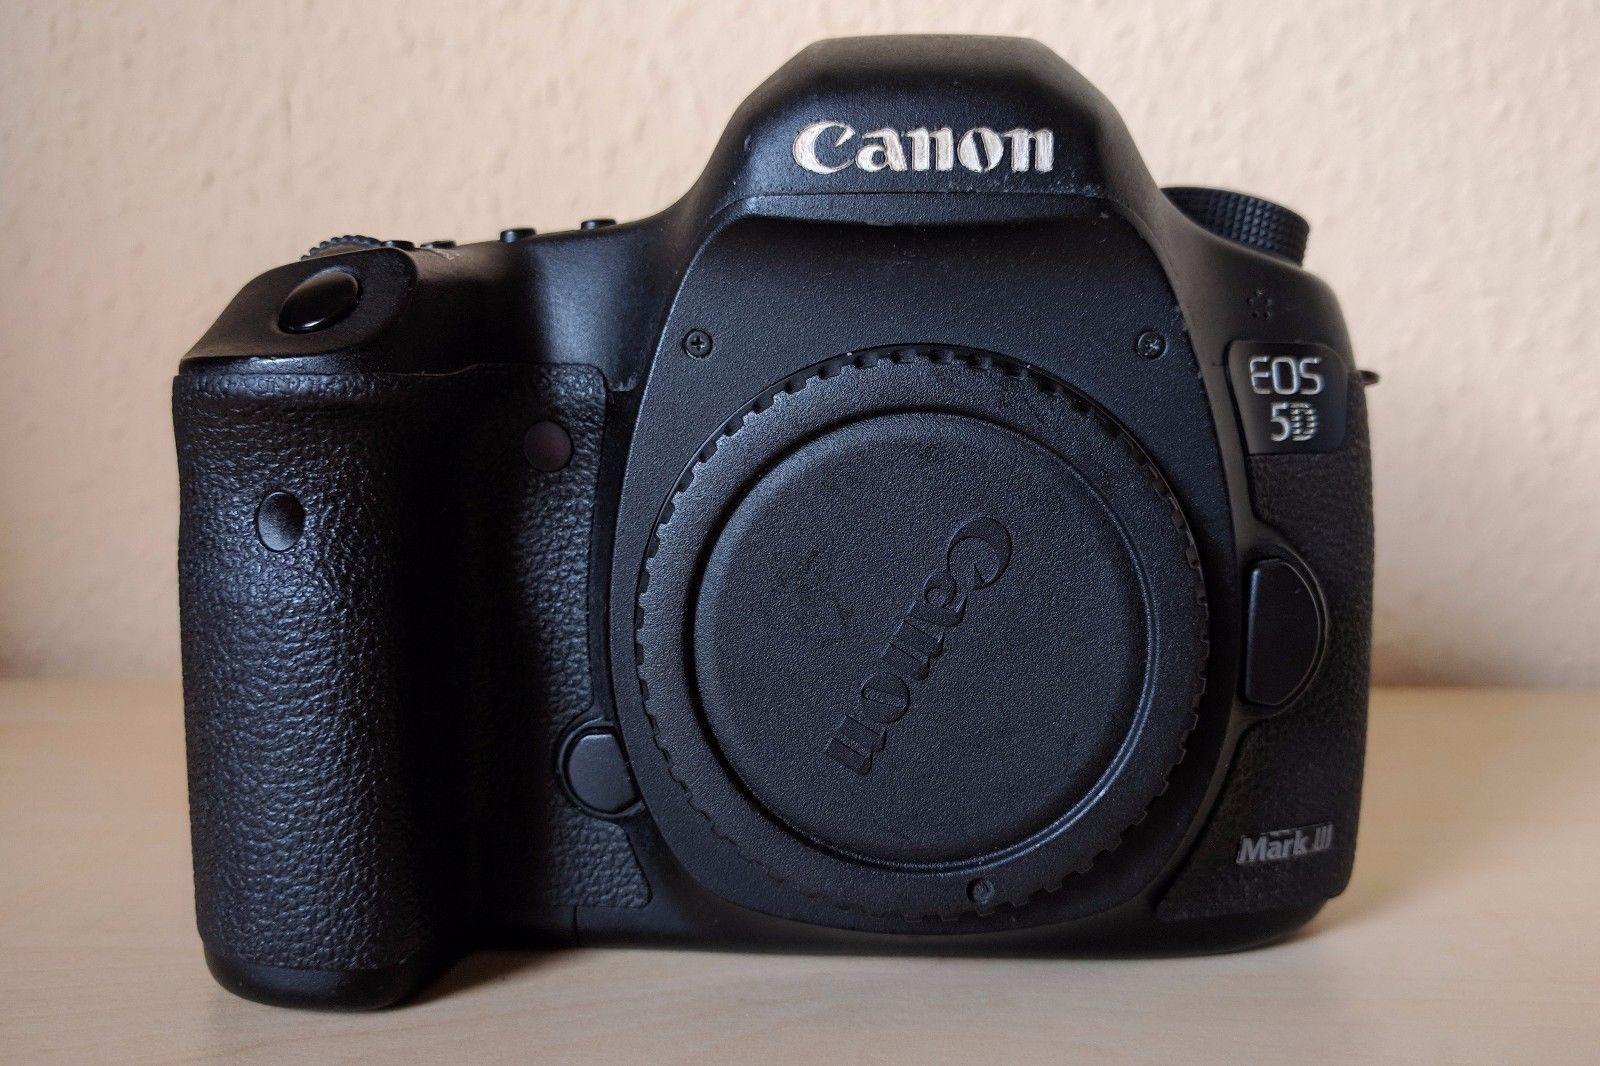 Canon EOS 5D Mark III 22.3 MP SLR-Digitalkamera - nur Gehäuse (unter 2000 Ausl.)